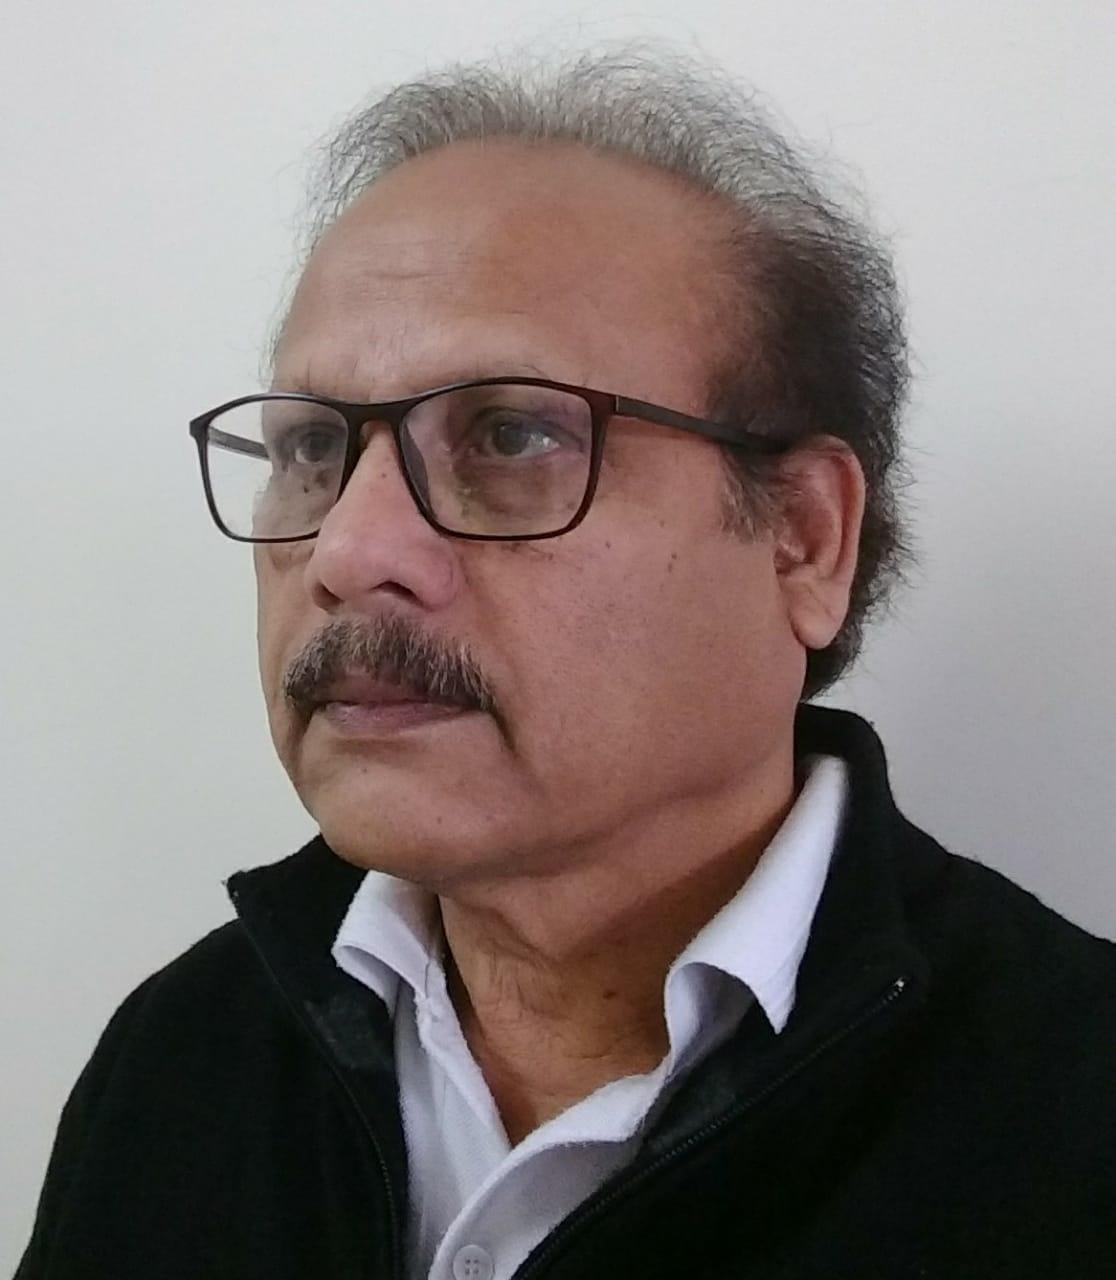 Irabotee.com,irabotee,sounak dutta,ইরাবতী.কম,copy righted by irabotee.com, Assamese literature Dipak Kumar Barkakati 1